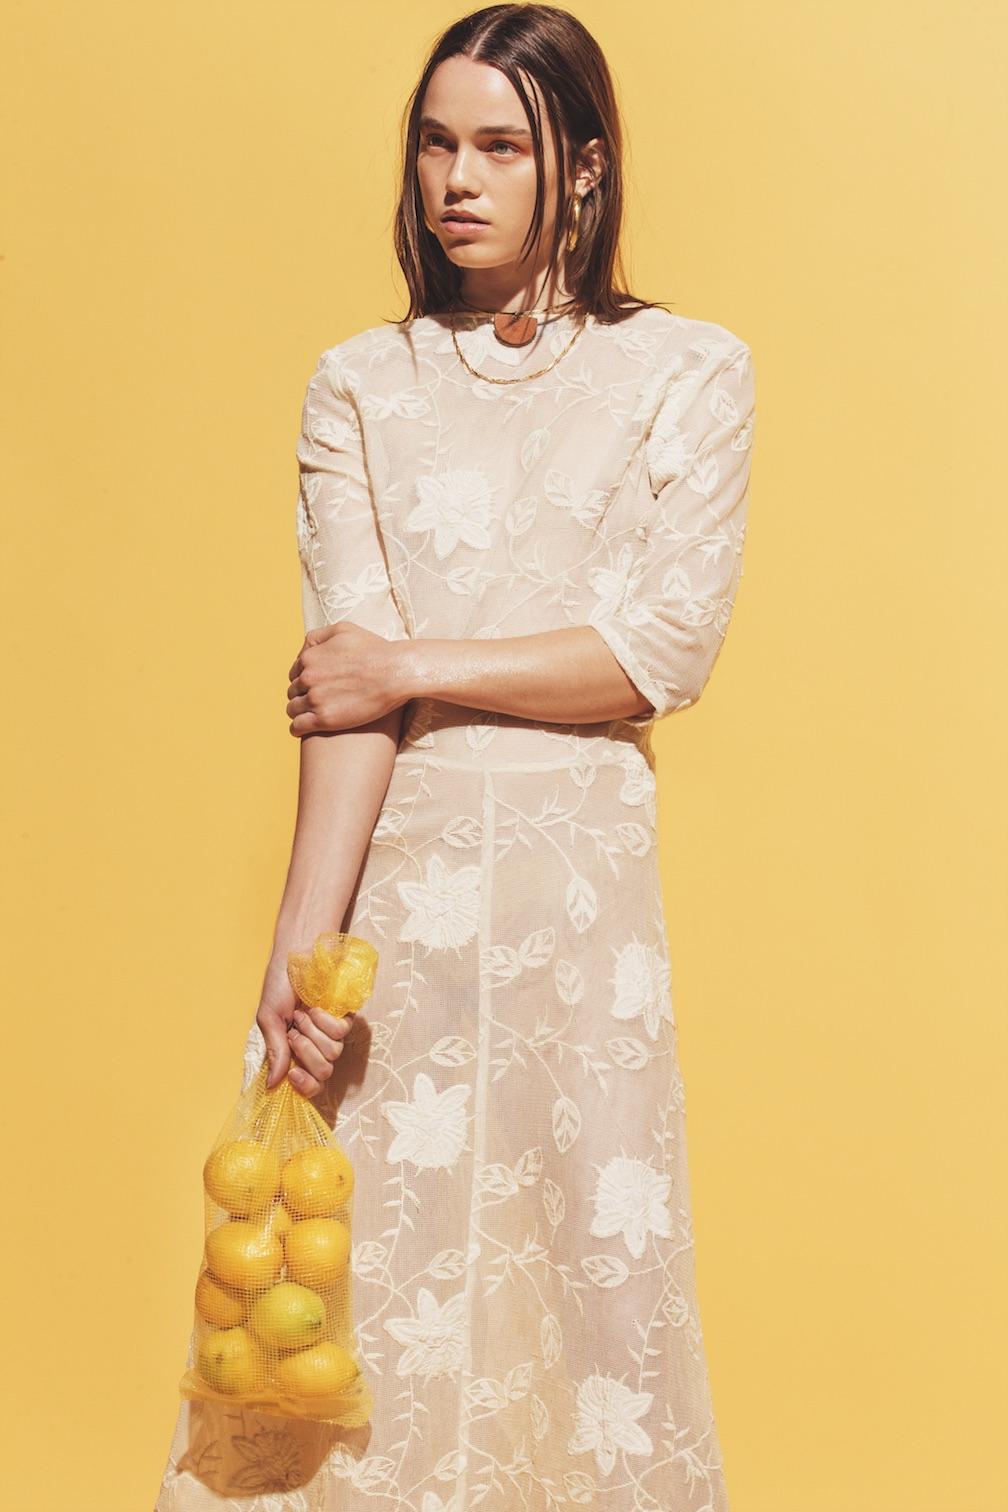 For Love and Lemons dress, Sophie Monet necklace.